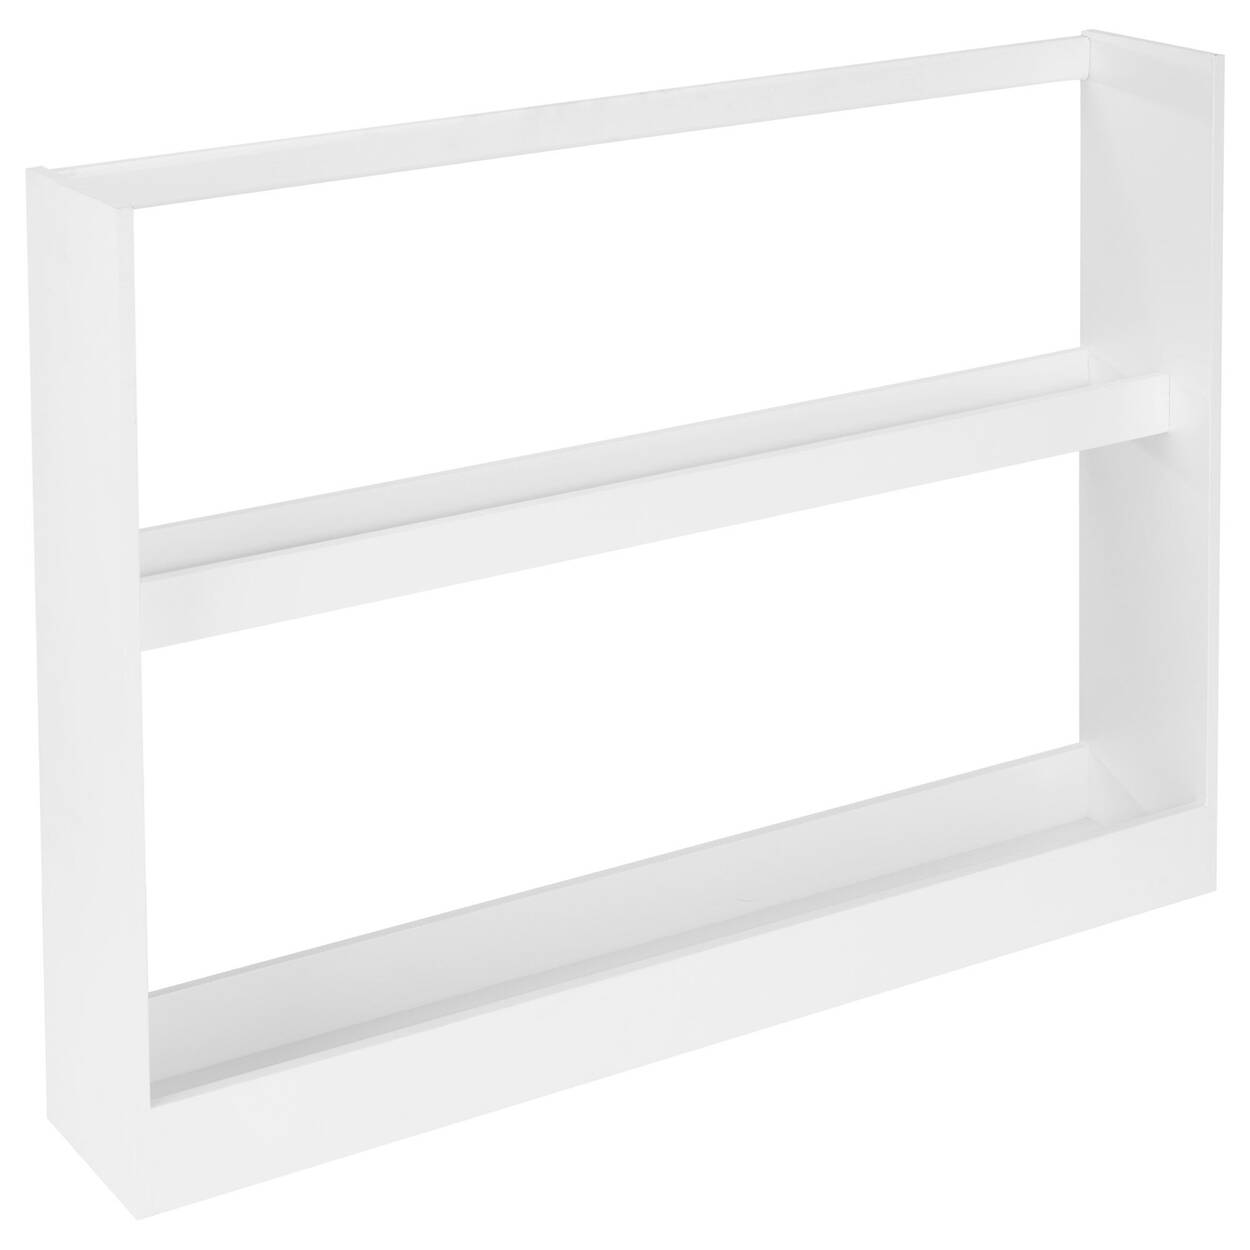 Two-Level Wall Shelf